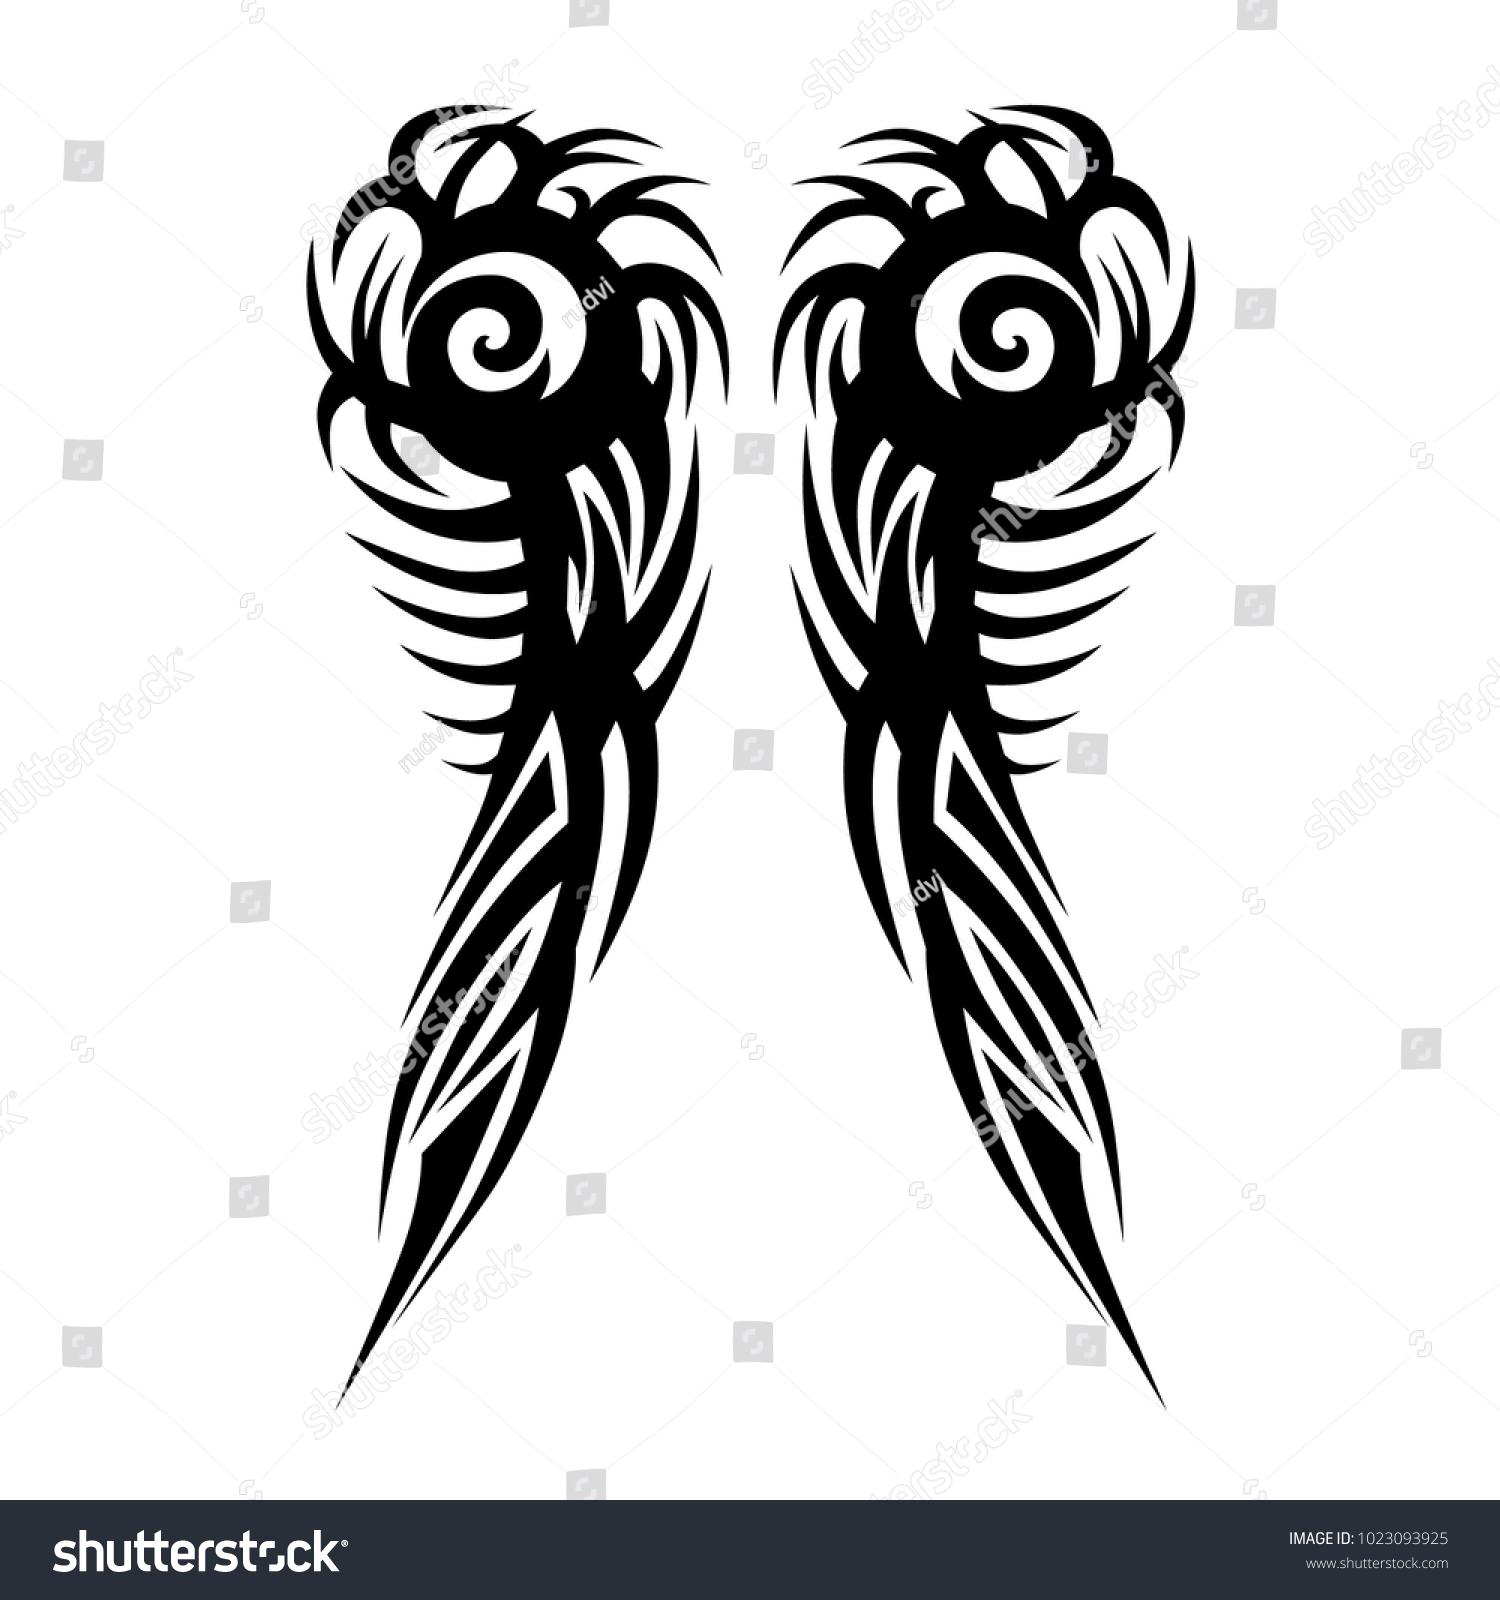 Tattoos Art Ideas Sleeve Designs Tribal Stock Vector Royalty Free